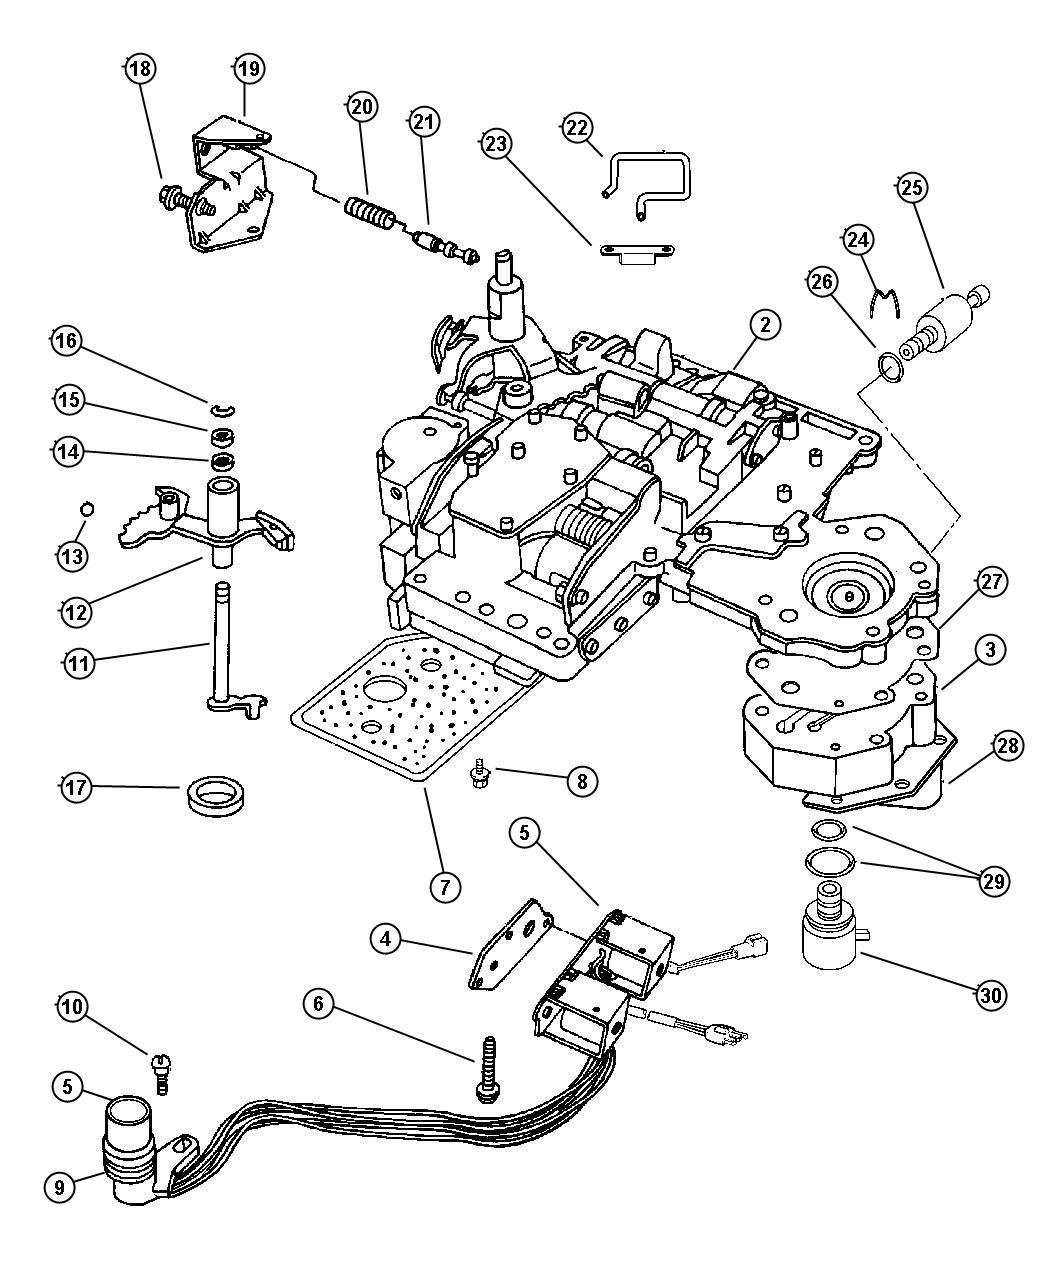 46re Transmission Parts Diagram : transmission, parts, diagram, Dodge, Transmission, Diagrams, Wiring, Diagram, Export, Cope-bitter, Cope-bitter.congressosifo2018.it